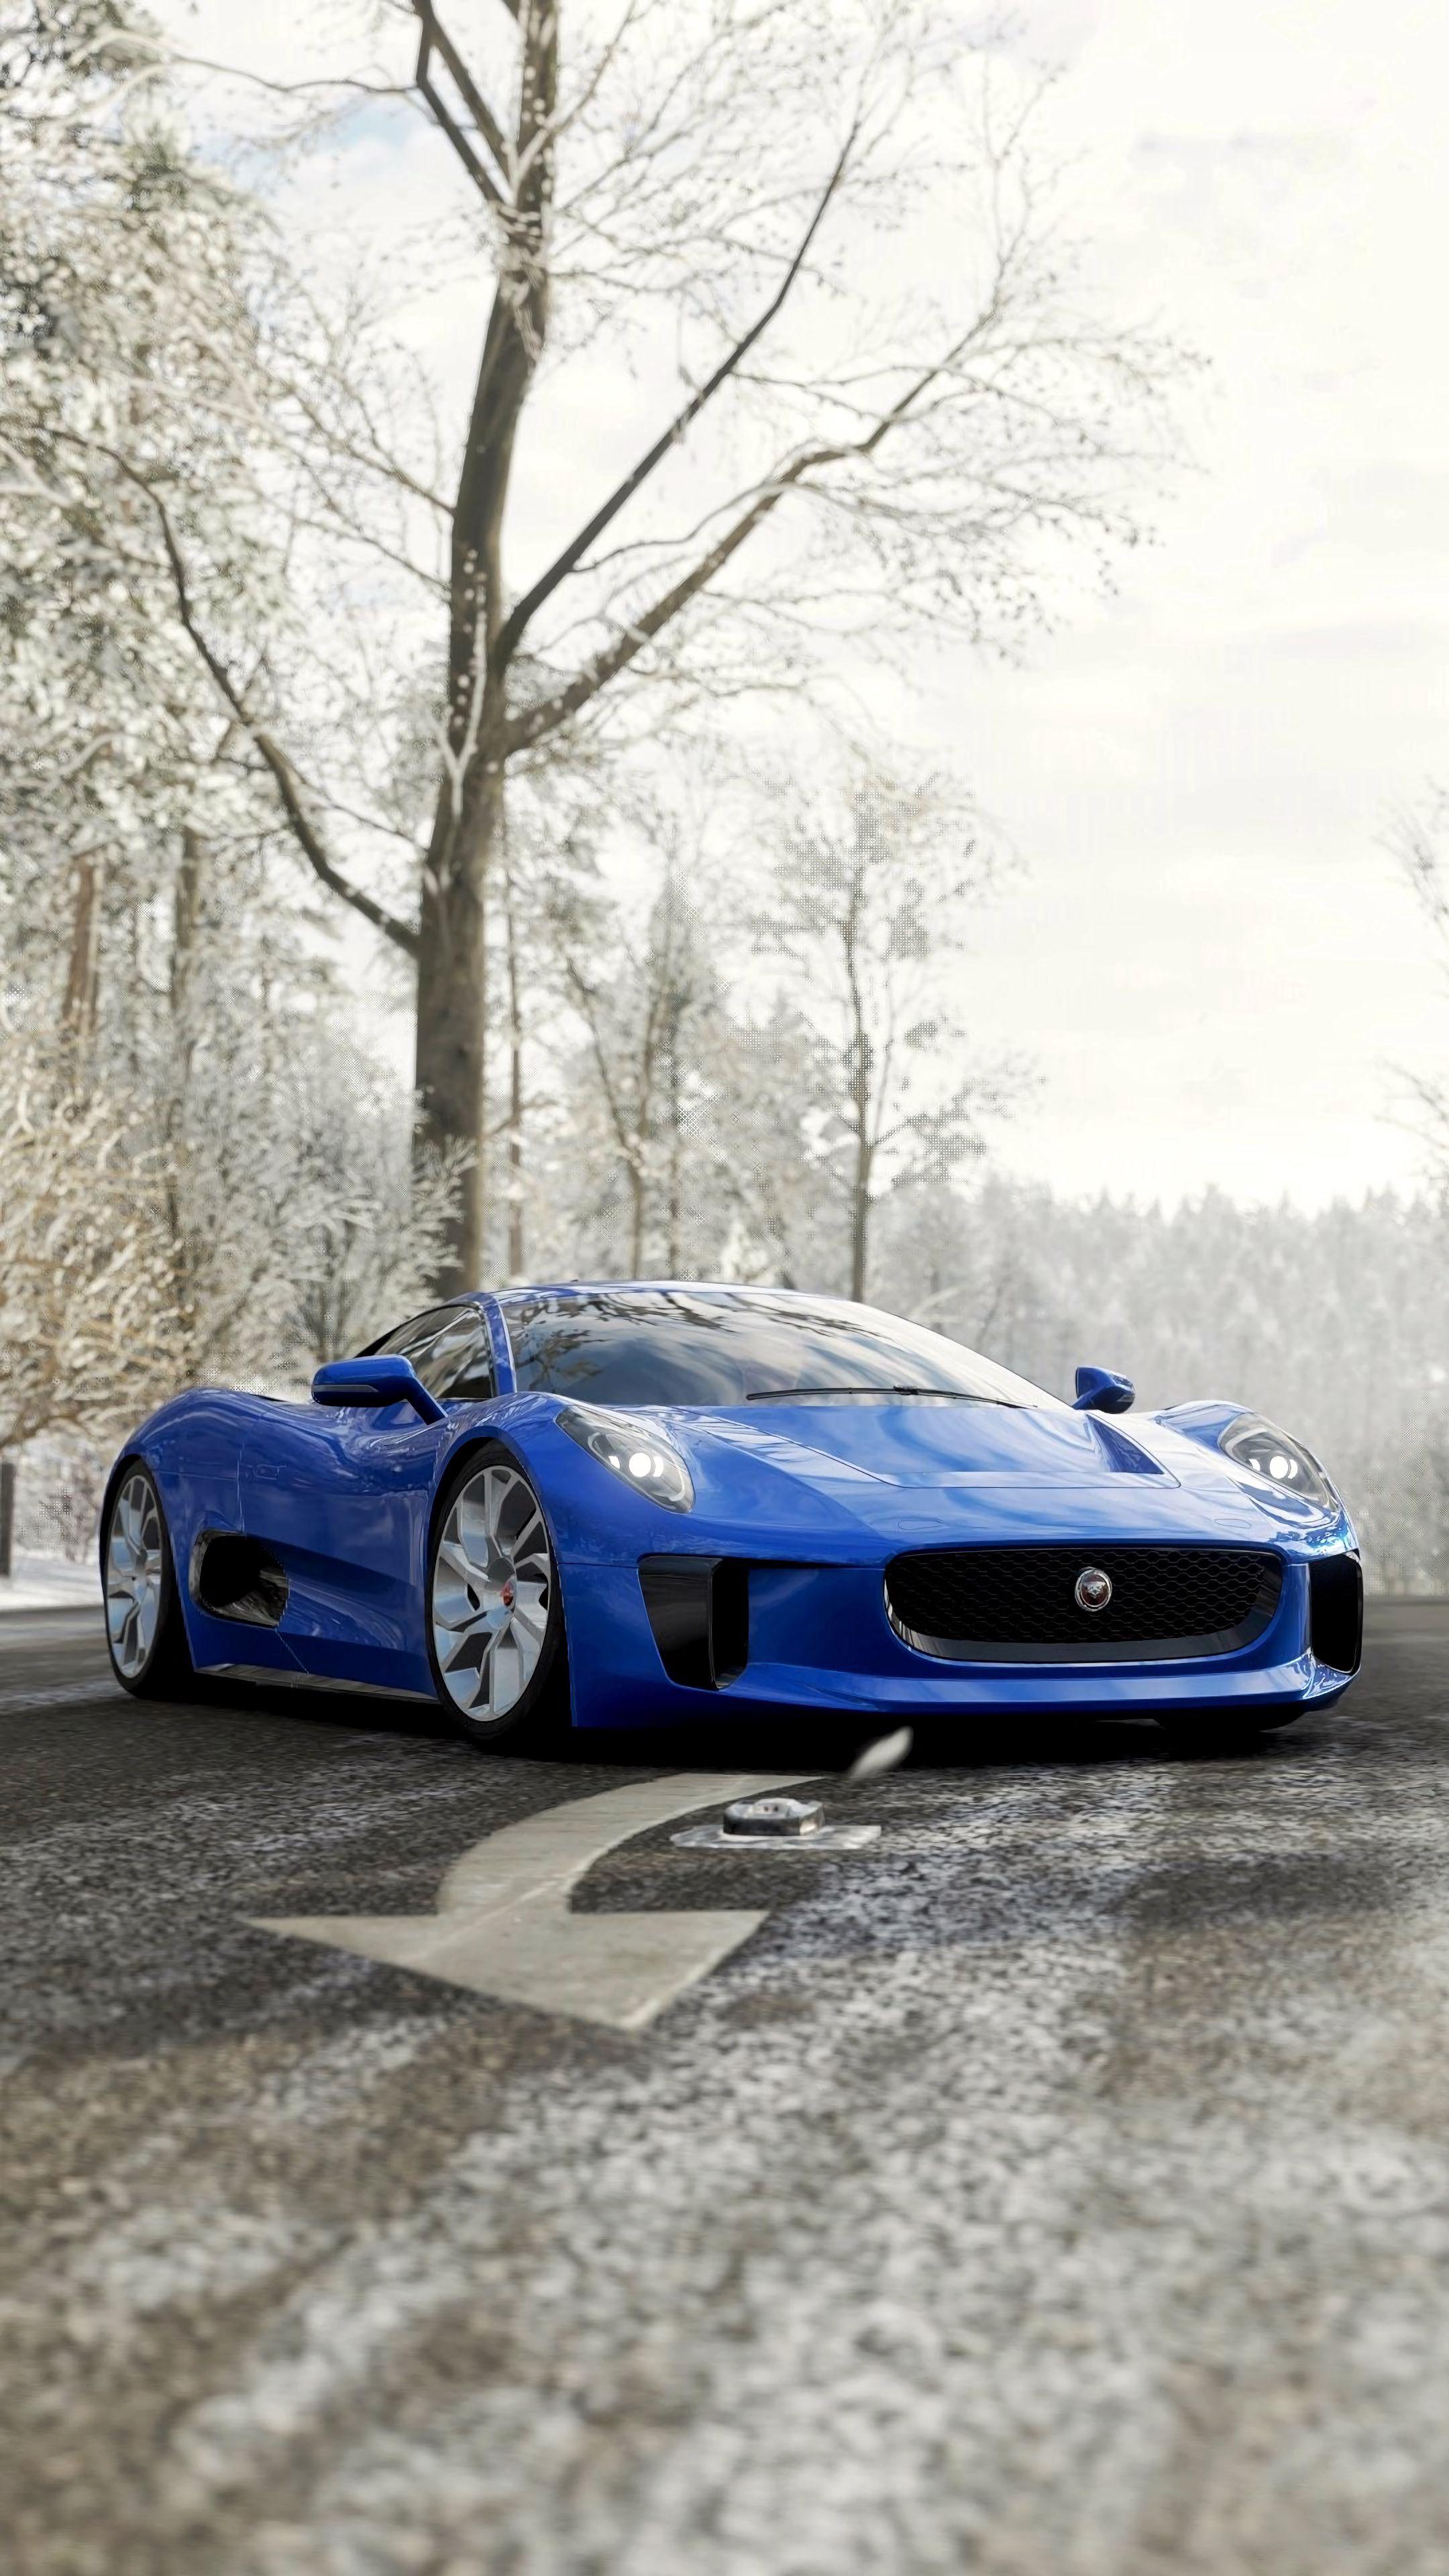 140383 download wallpaper Supercar, Sports, Jaguar, Cars, Sports Car, Jaguar C-X75 screensavers and pictures for free